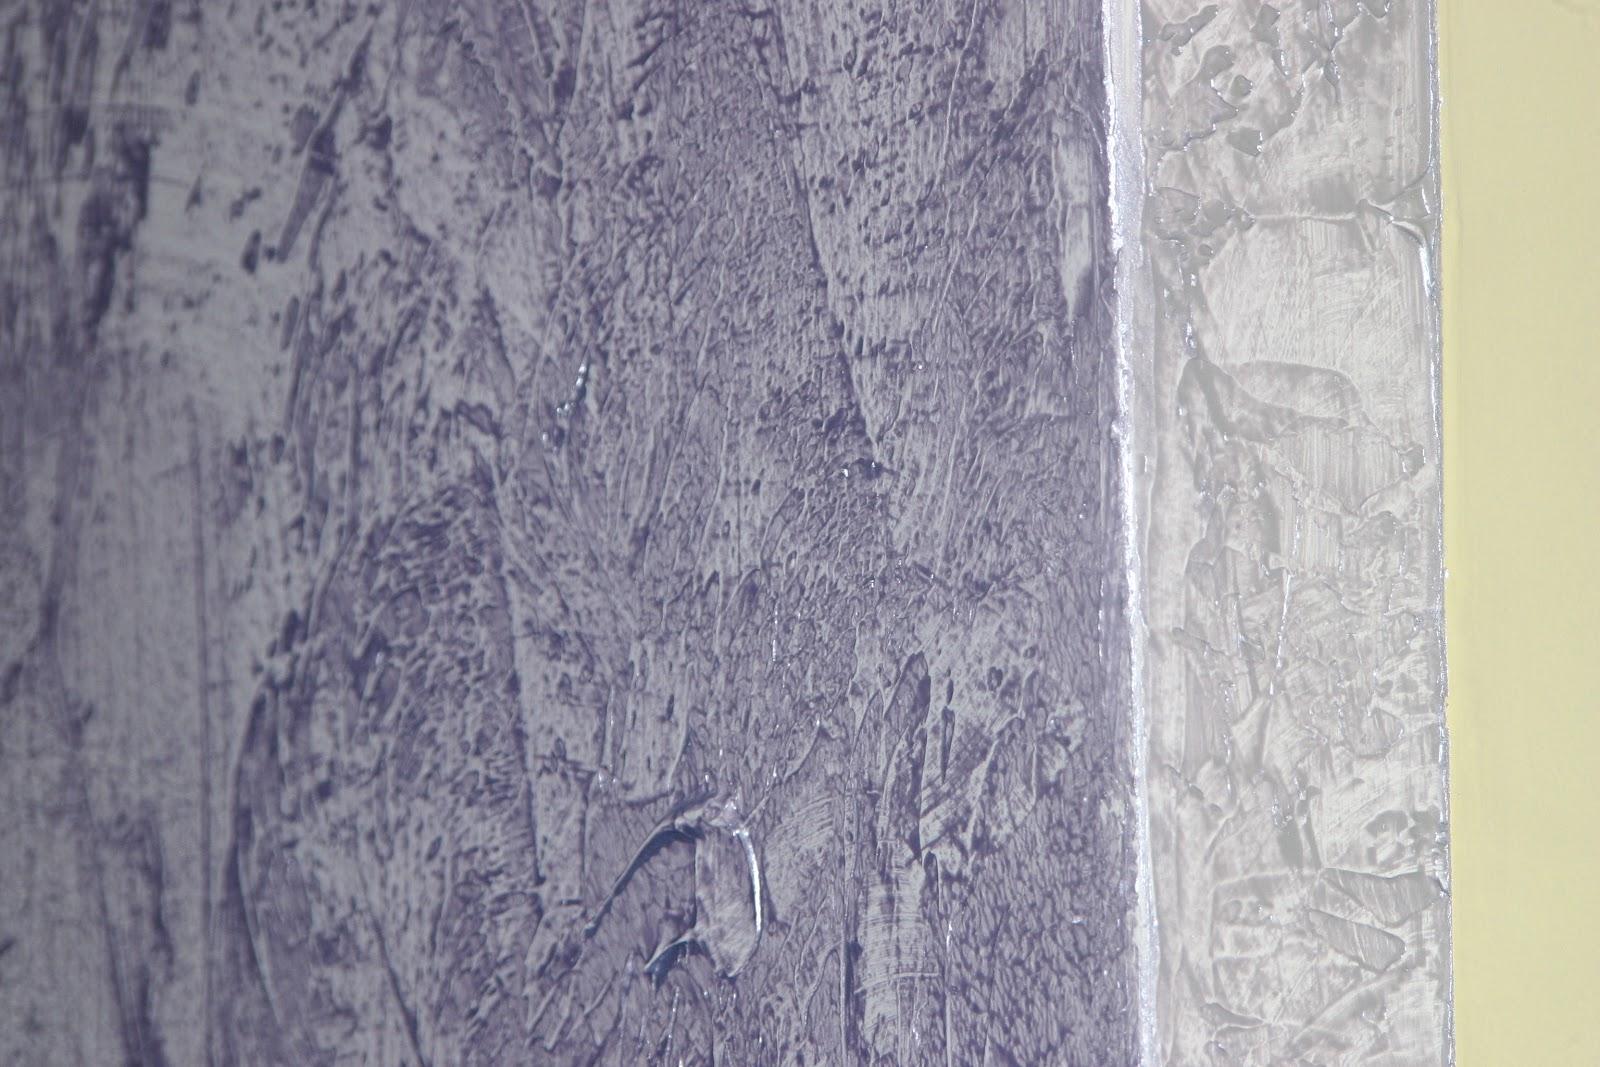 Beto Textura Marmorato Textura Com Efeito Decorativo N 52